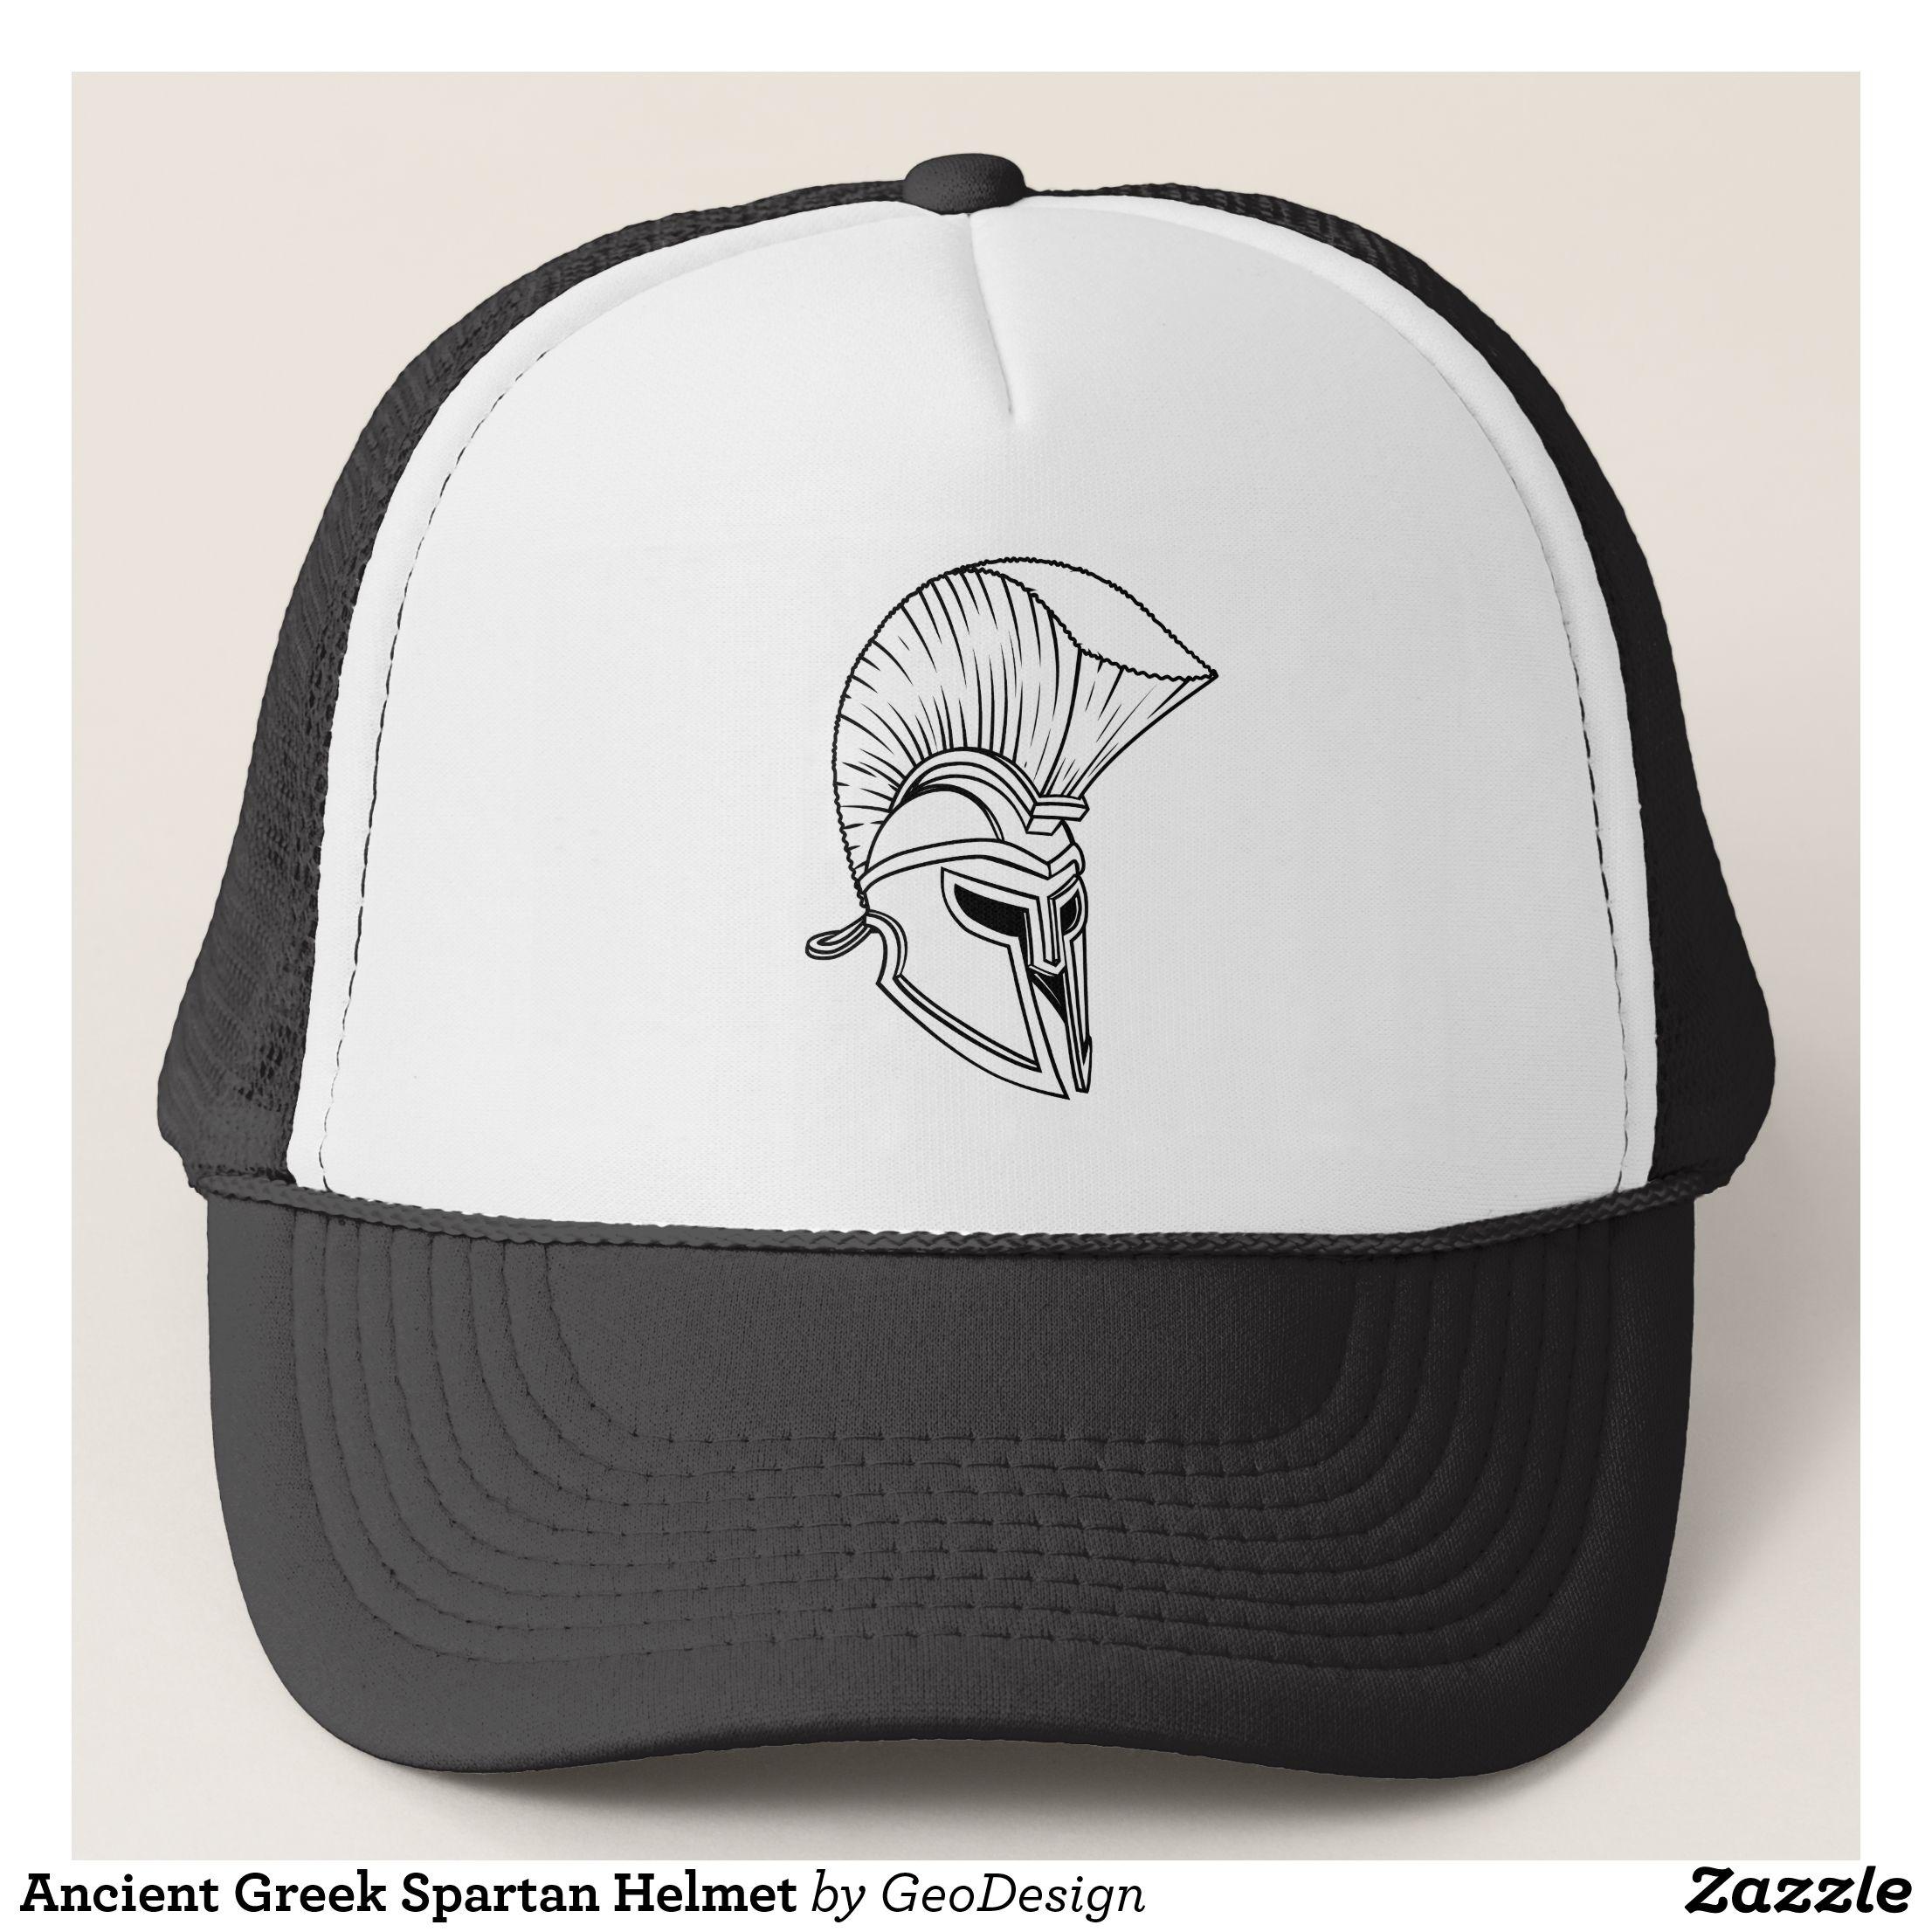 size 40 476dc a7724 Ancient Greek Spartan Helmet Trucker Hat - Urban Hunter Fisher Farmer  Redneck Hats By Talented Fashion And Graphic Designers -  hats  truckerhat  ...